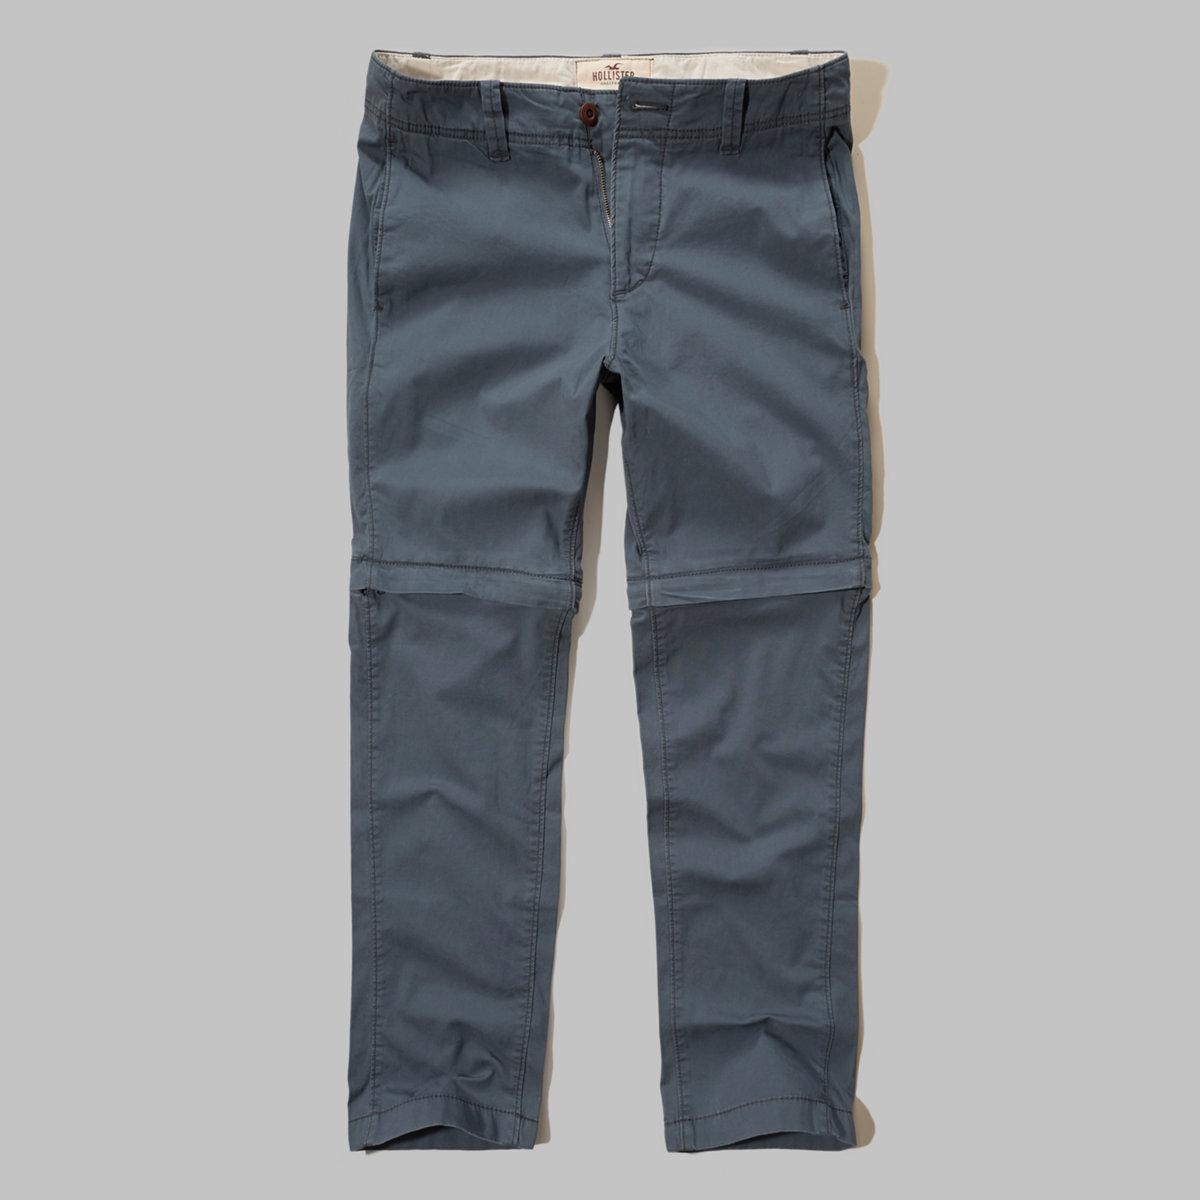 Hollister Zipaway Zipper Fly Pants